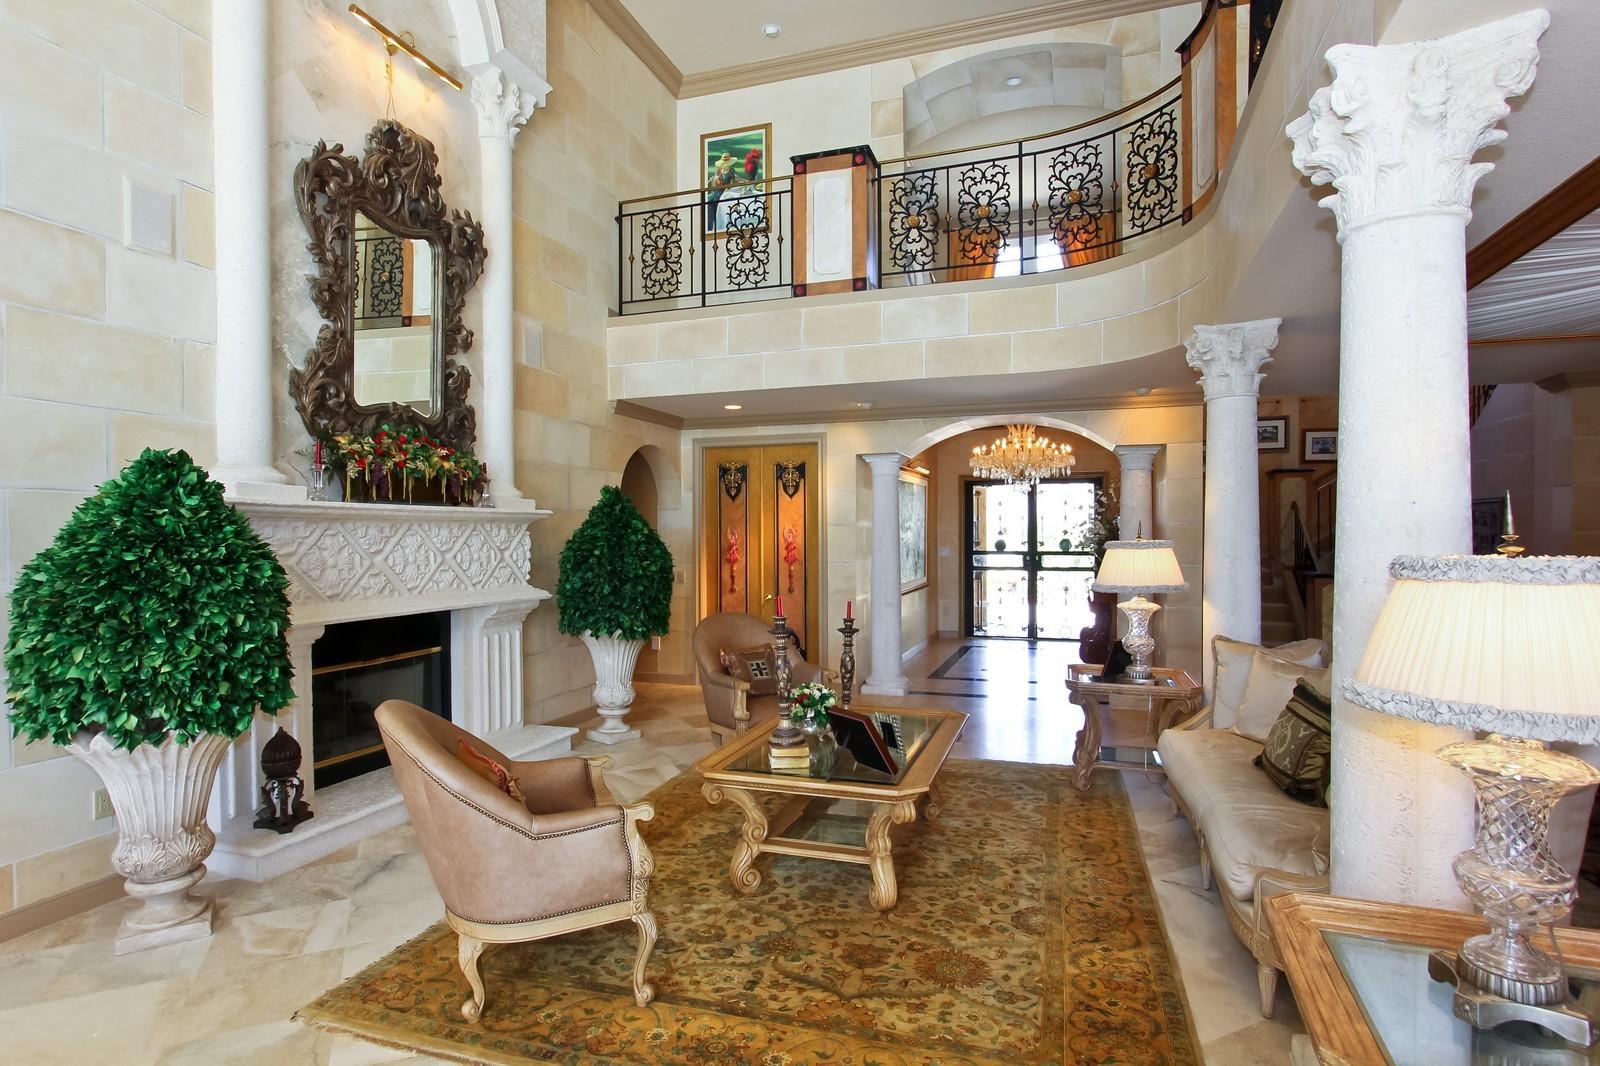 Real Estate Photography - 7015 Ayrshire Ln, Boca Raton, FL, 33496 - Living Room